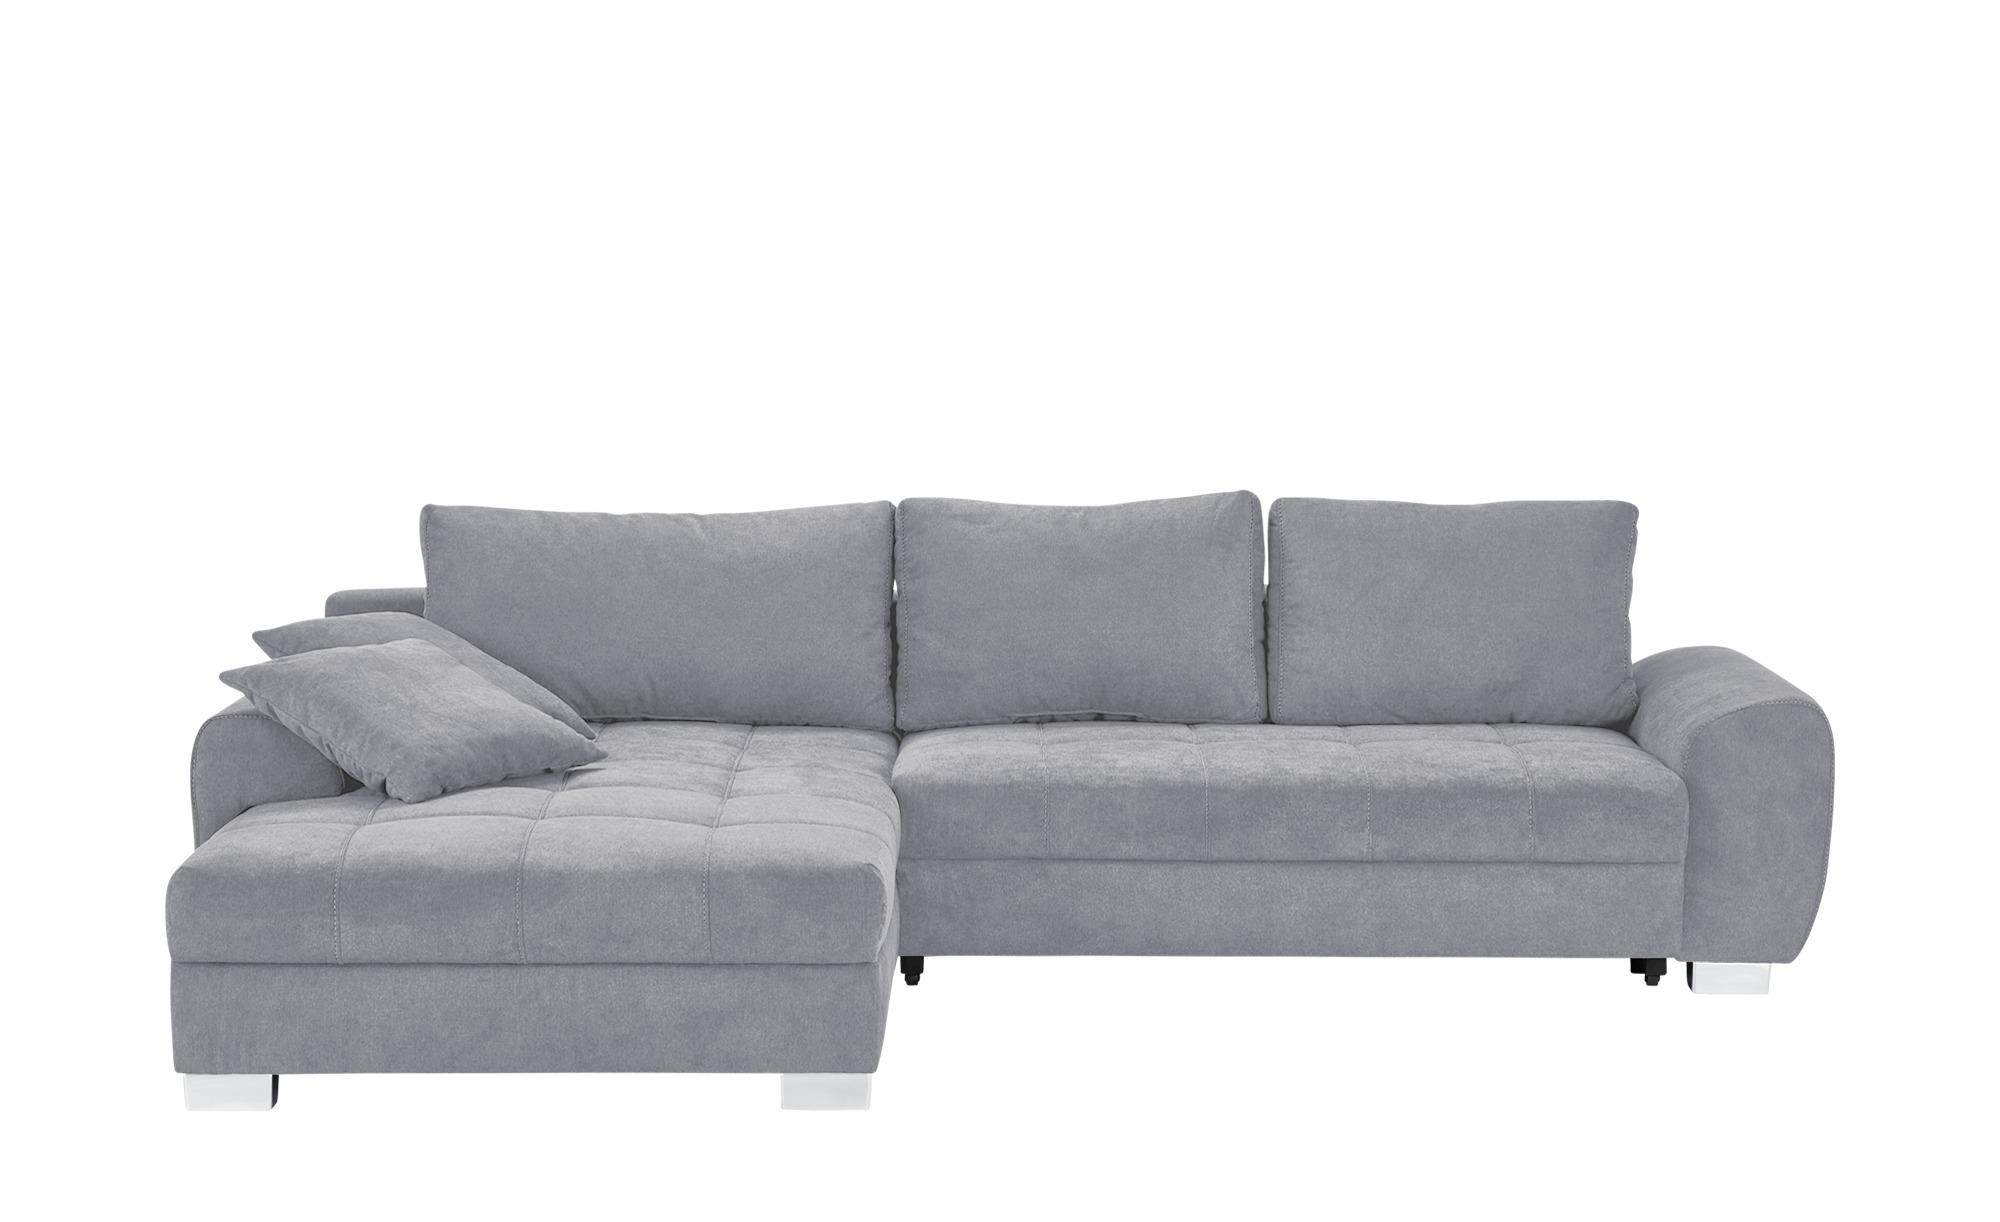 Ecksofa caren breite h he 88 cm grau online kaufen bei for Ecksofa unter 100